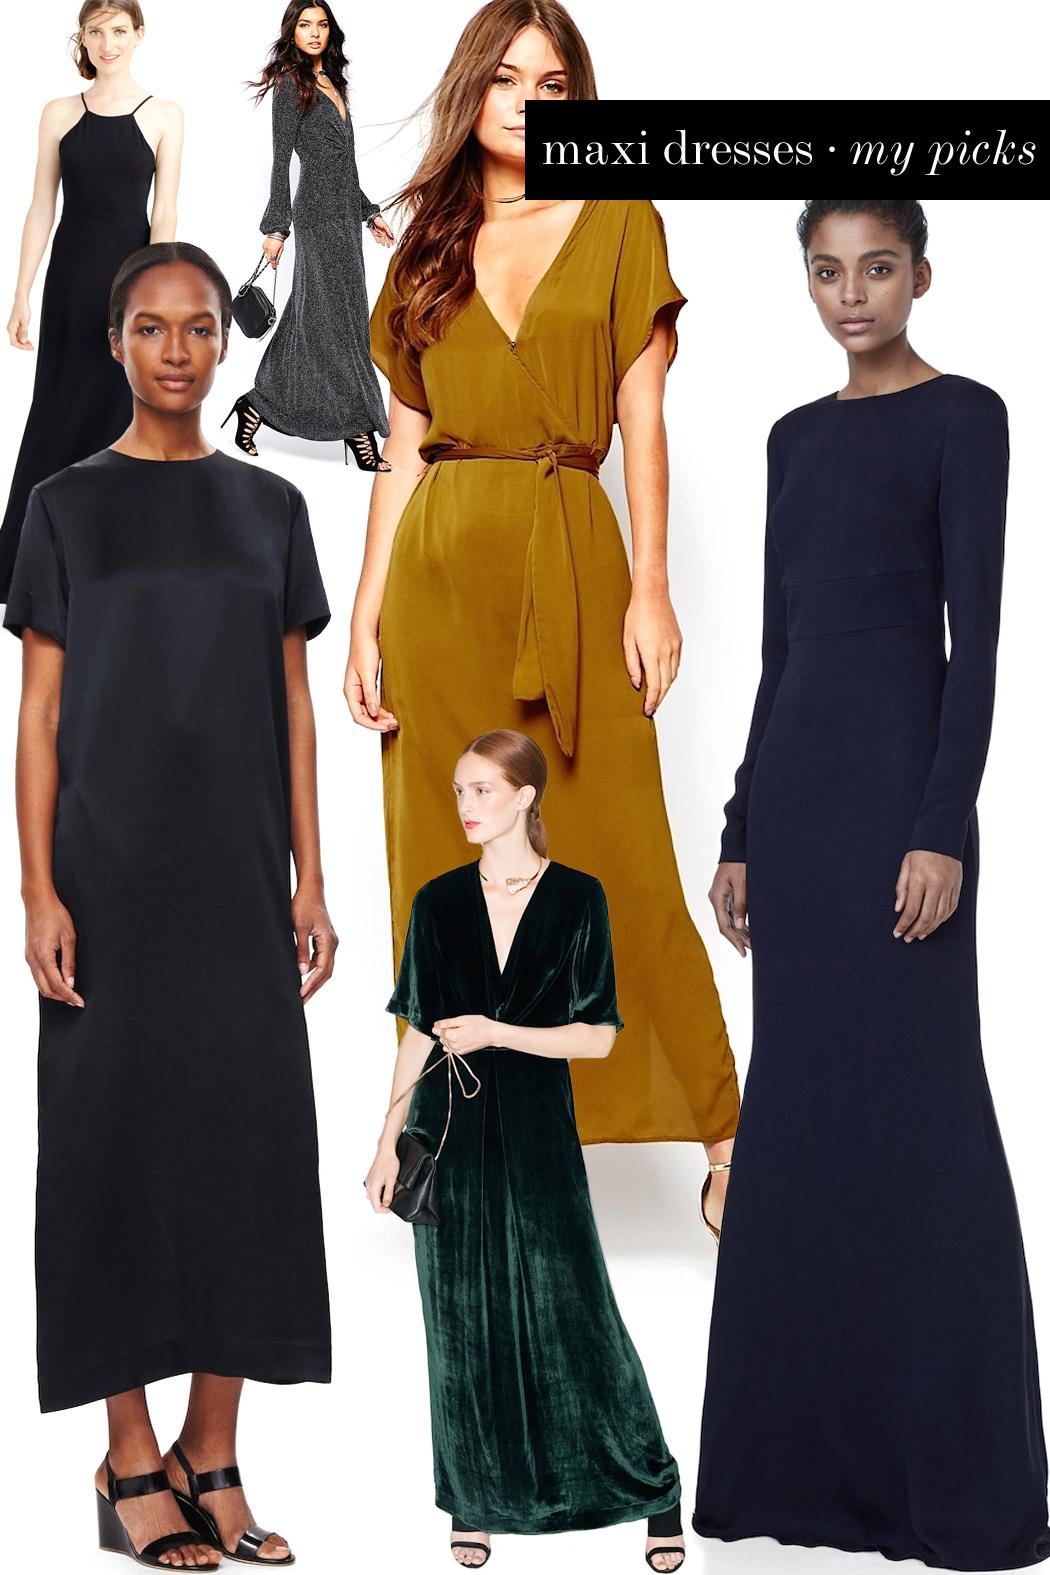 Maxi dress under 200 fash-n-chips.com 0